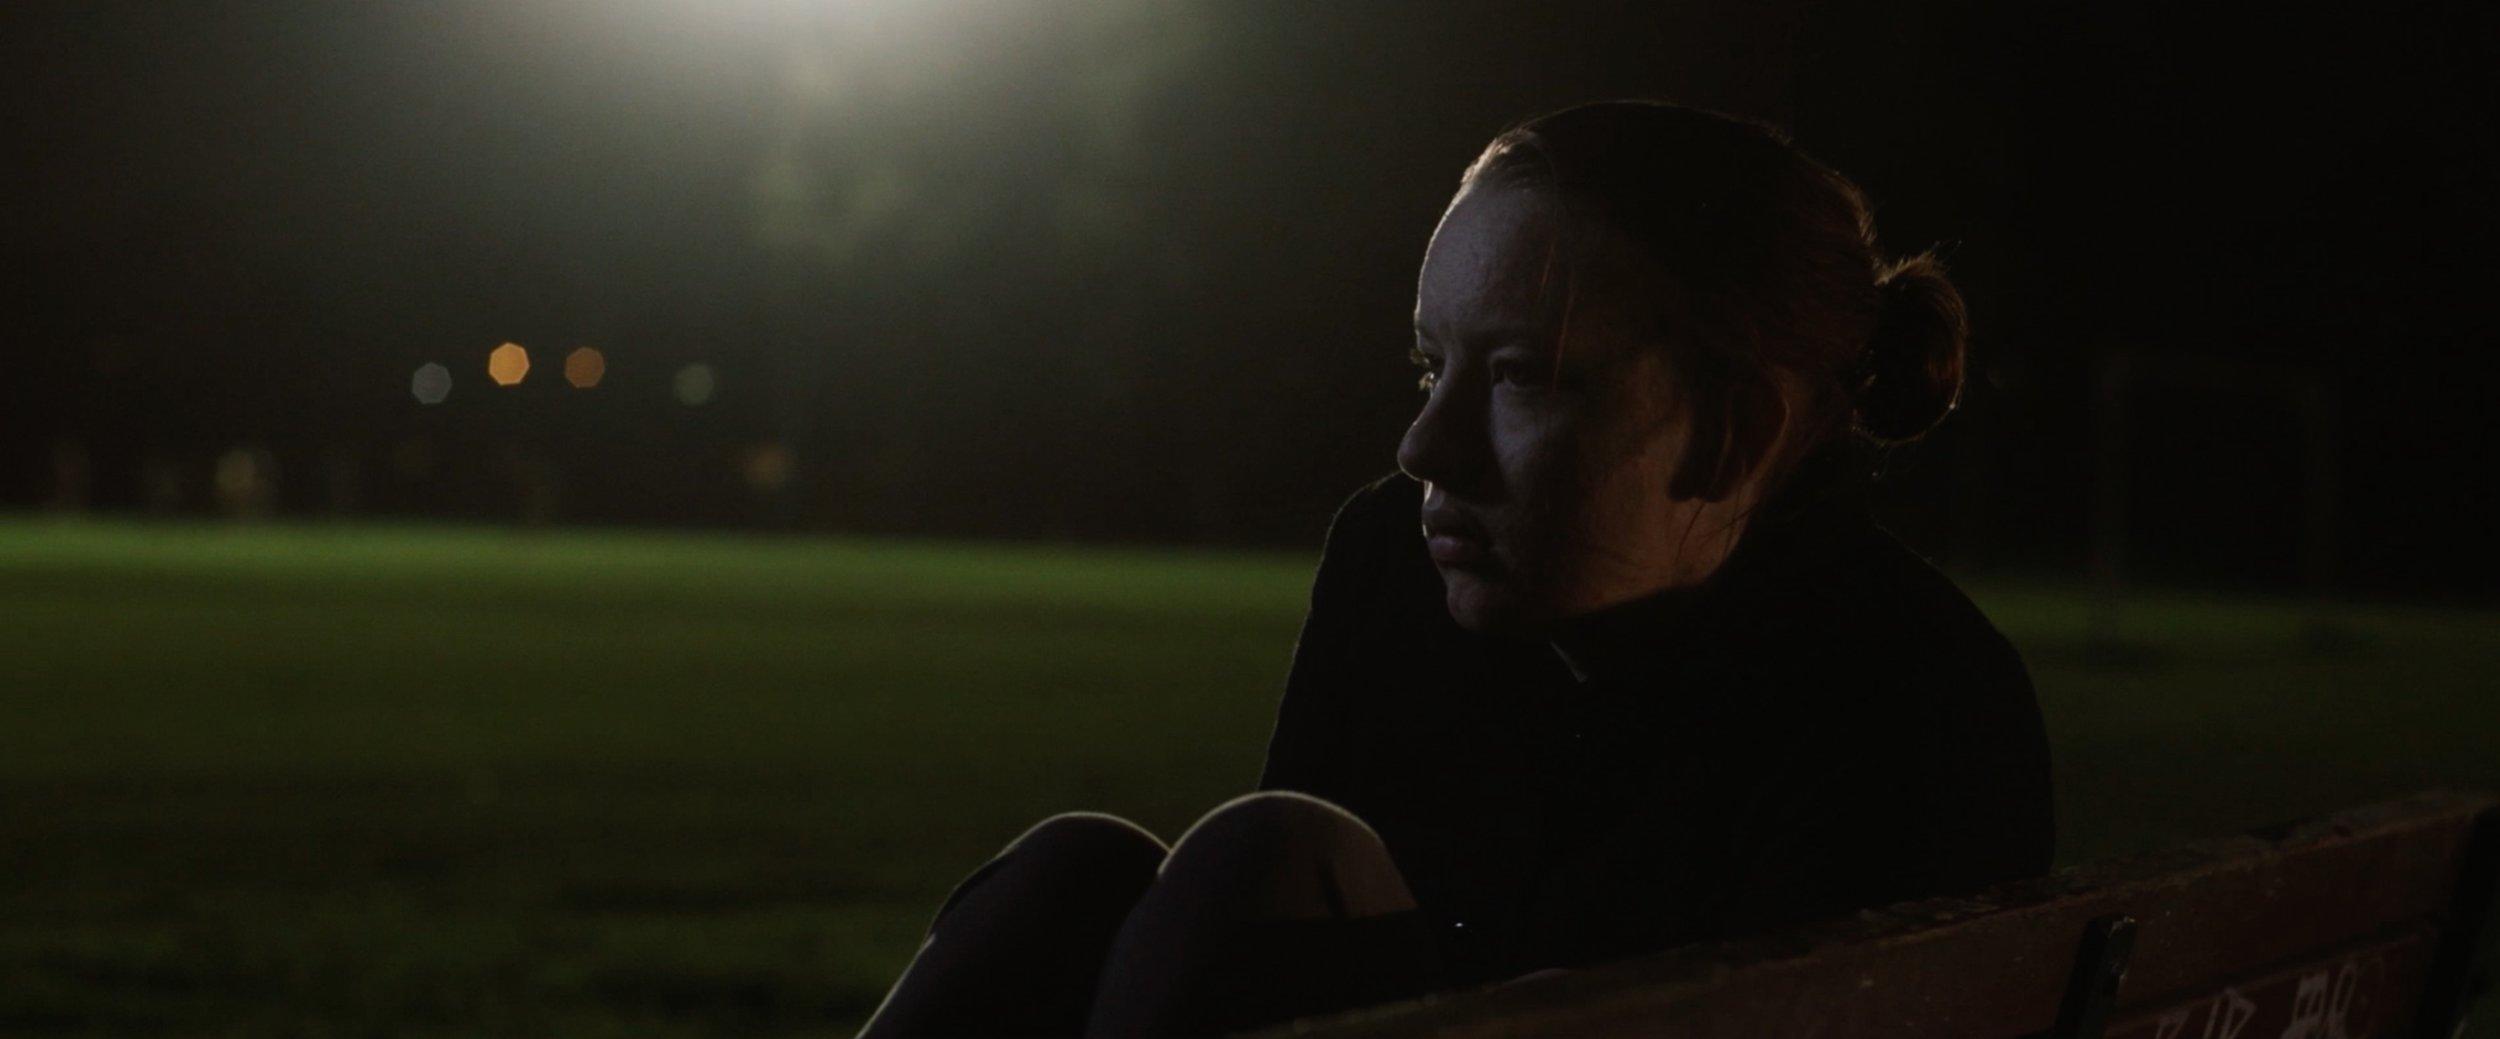 Client: STREAT Project: Belong (Laura) Format: 7min short film